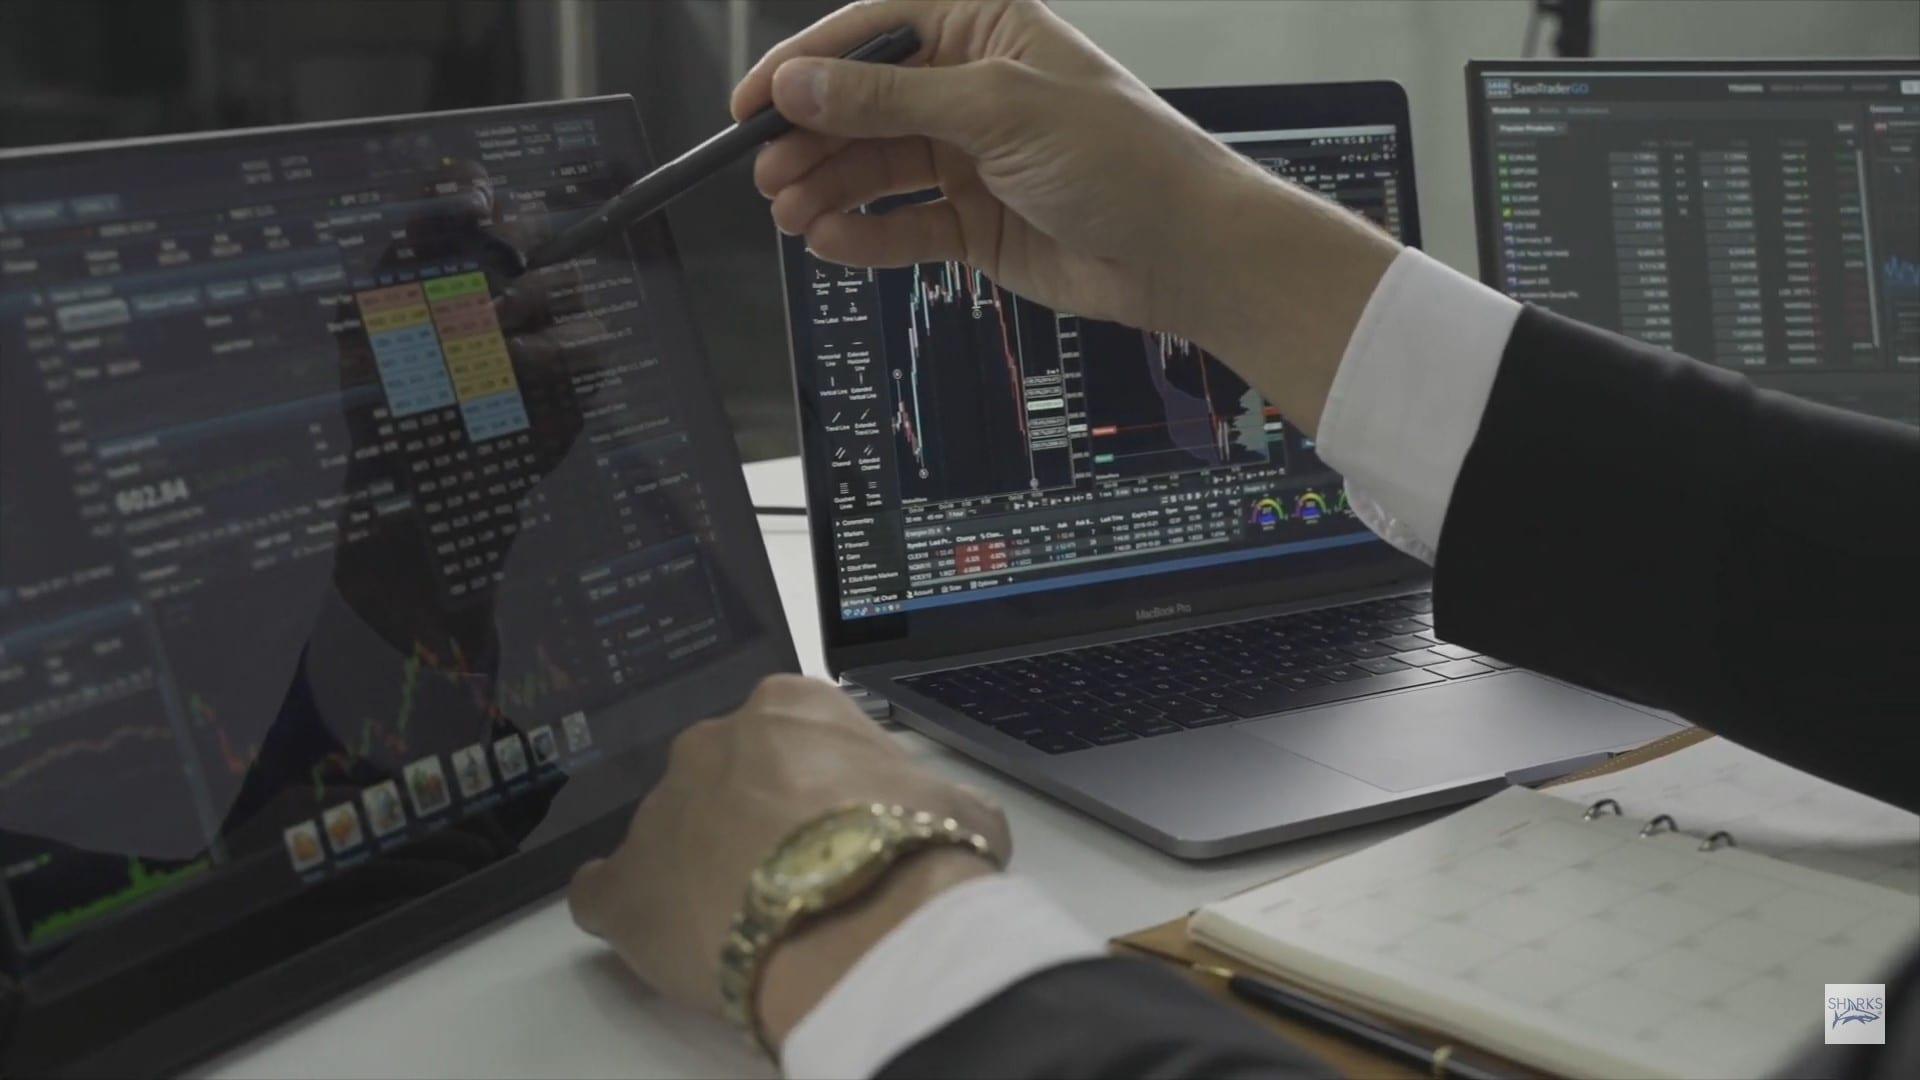 6D Sharks Mako έξτρα οθόνη για laptop